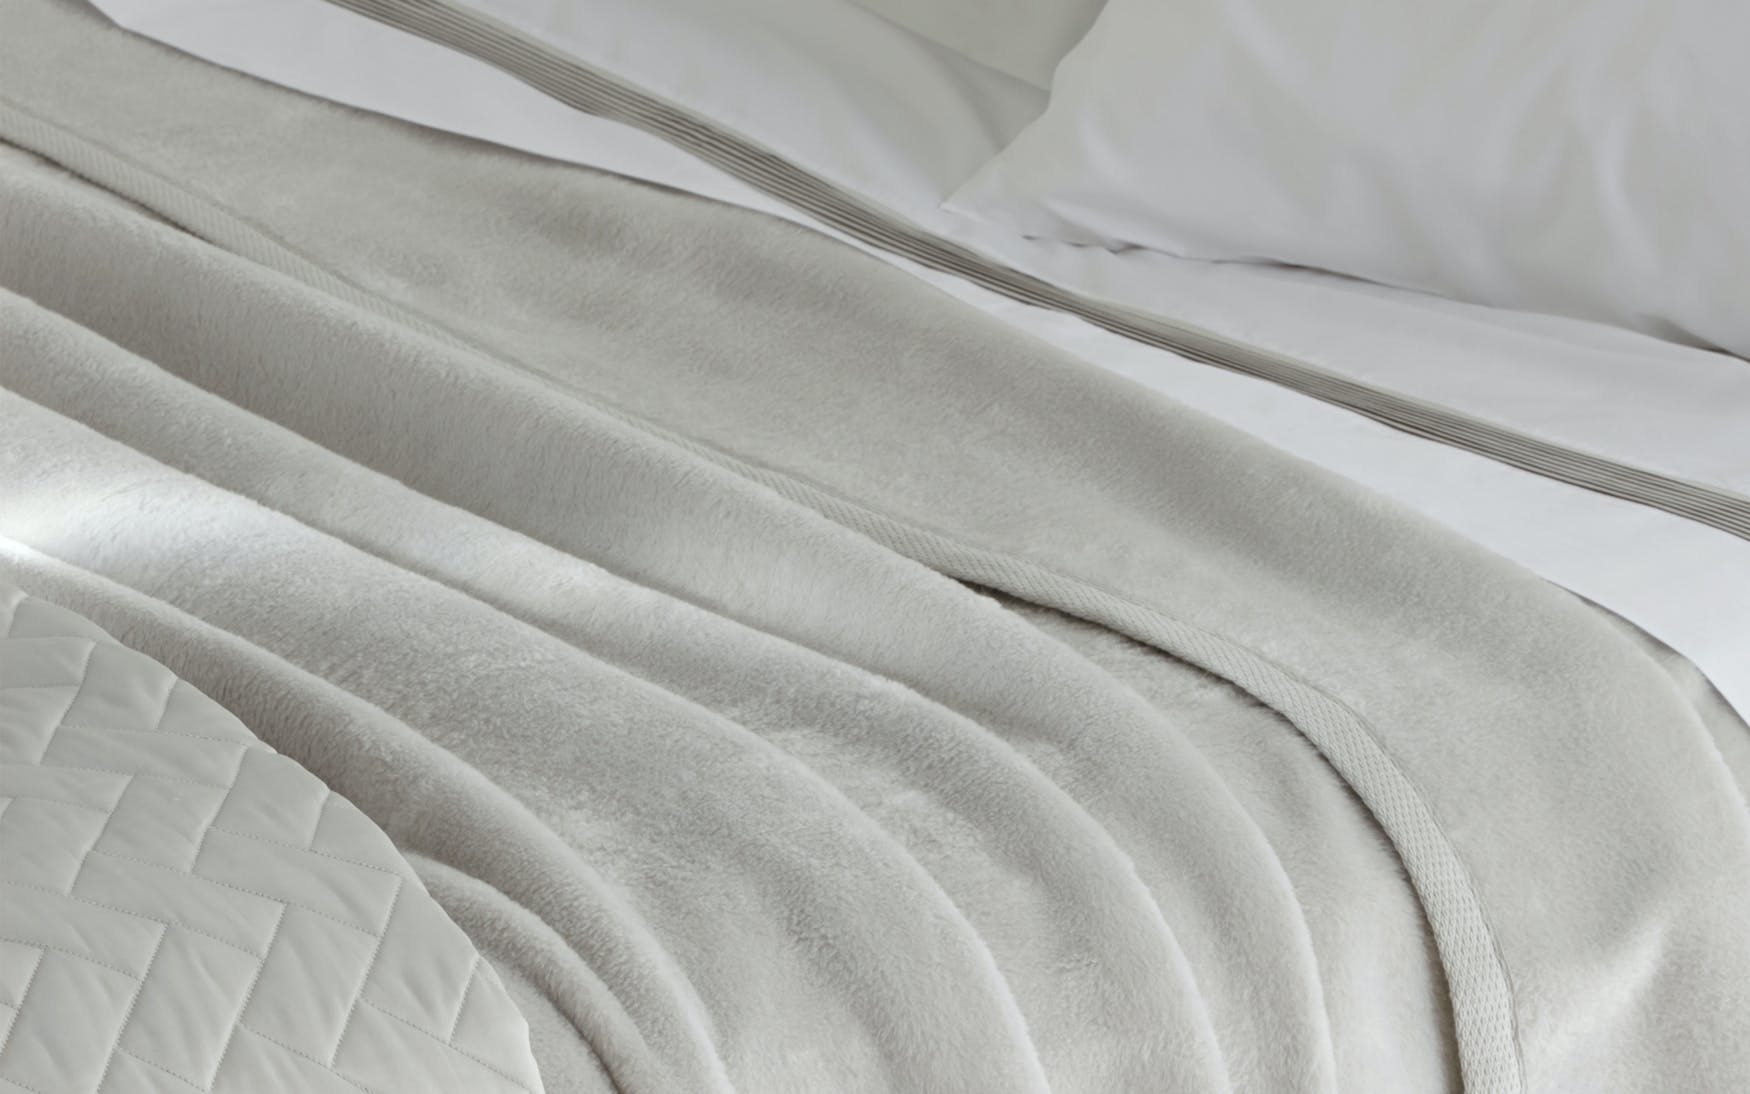 Matouk Sintra Blanket- Ultra Soft 100% Cotton